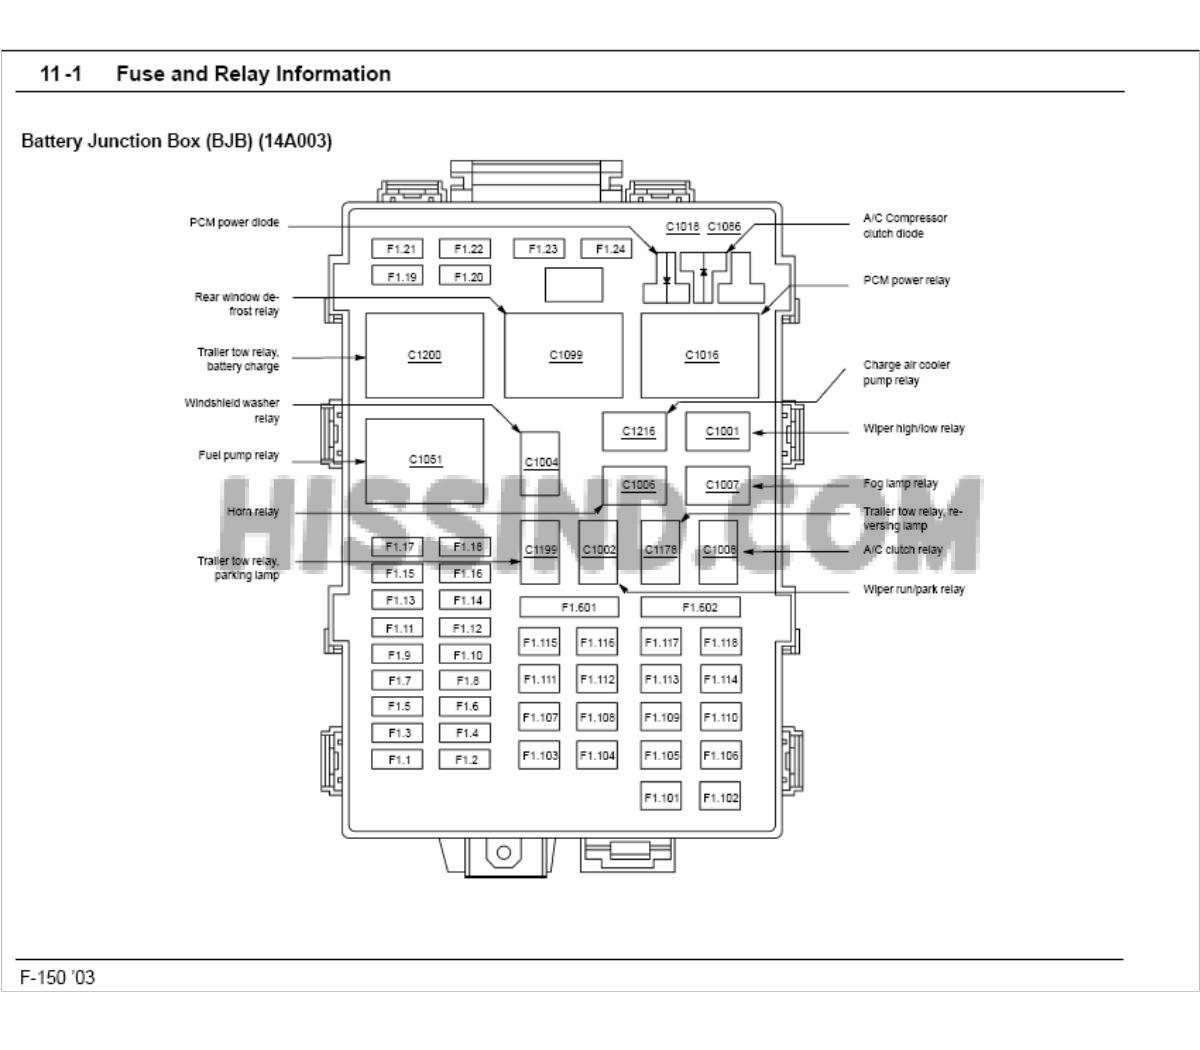 02 Ford Taurus Fuse Box Diagram As Well 2007 Hyundai Santa Fe Fuse Box